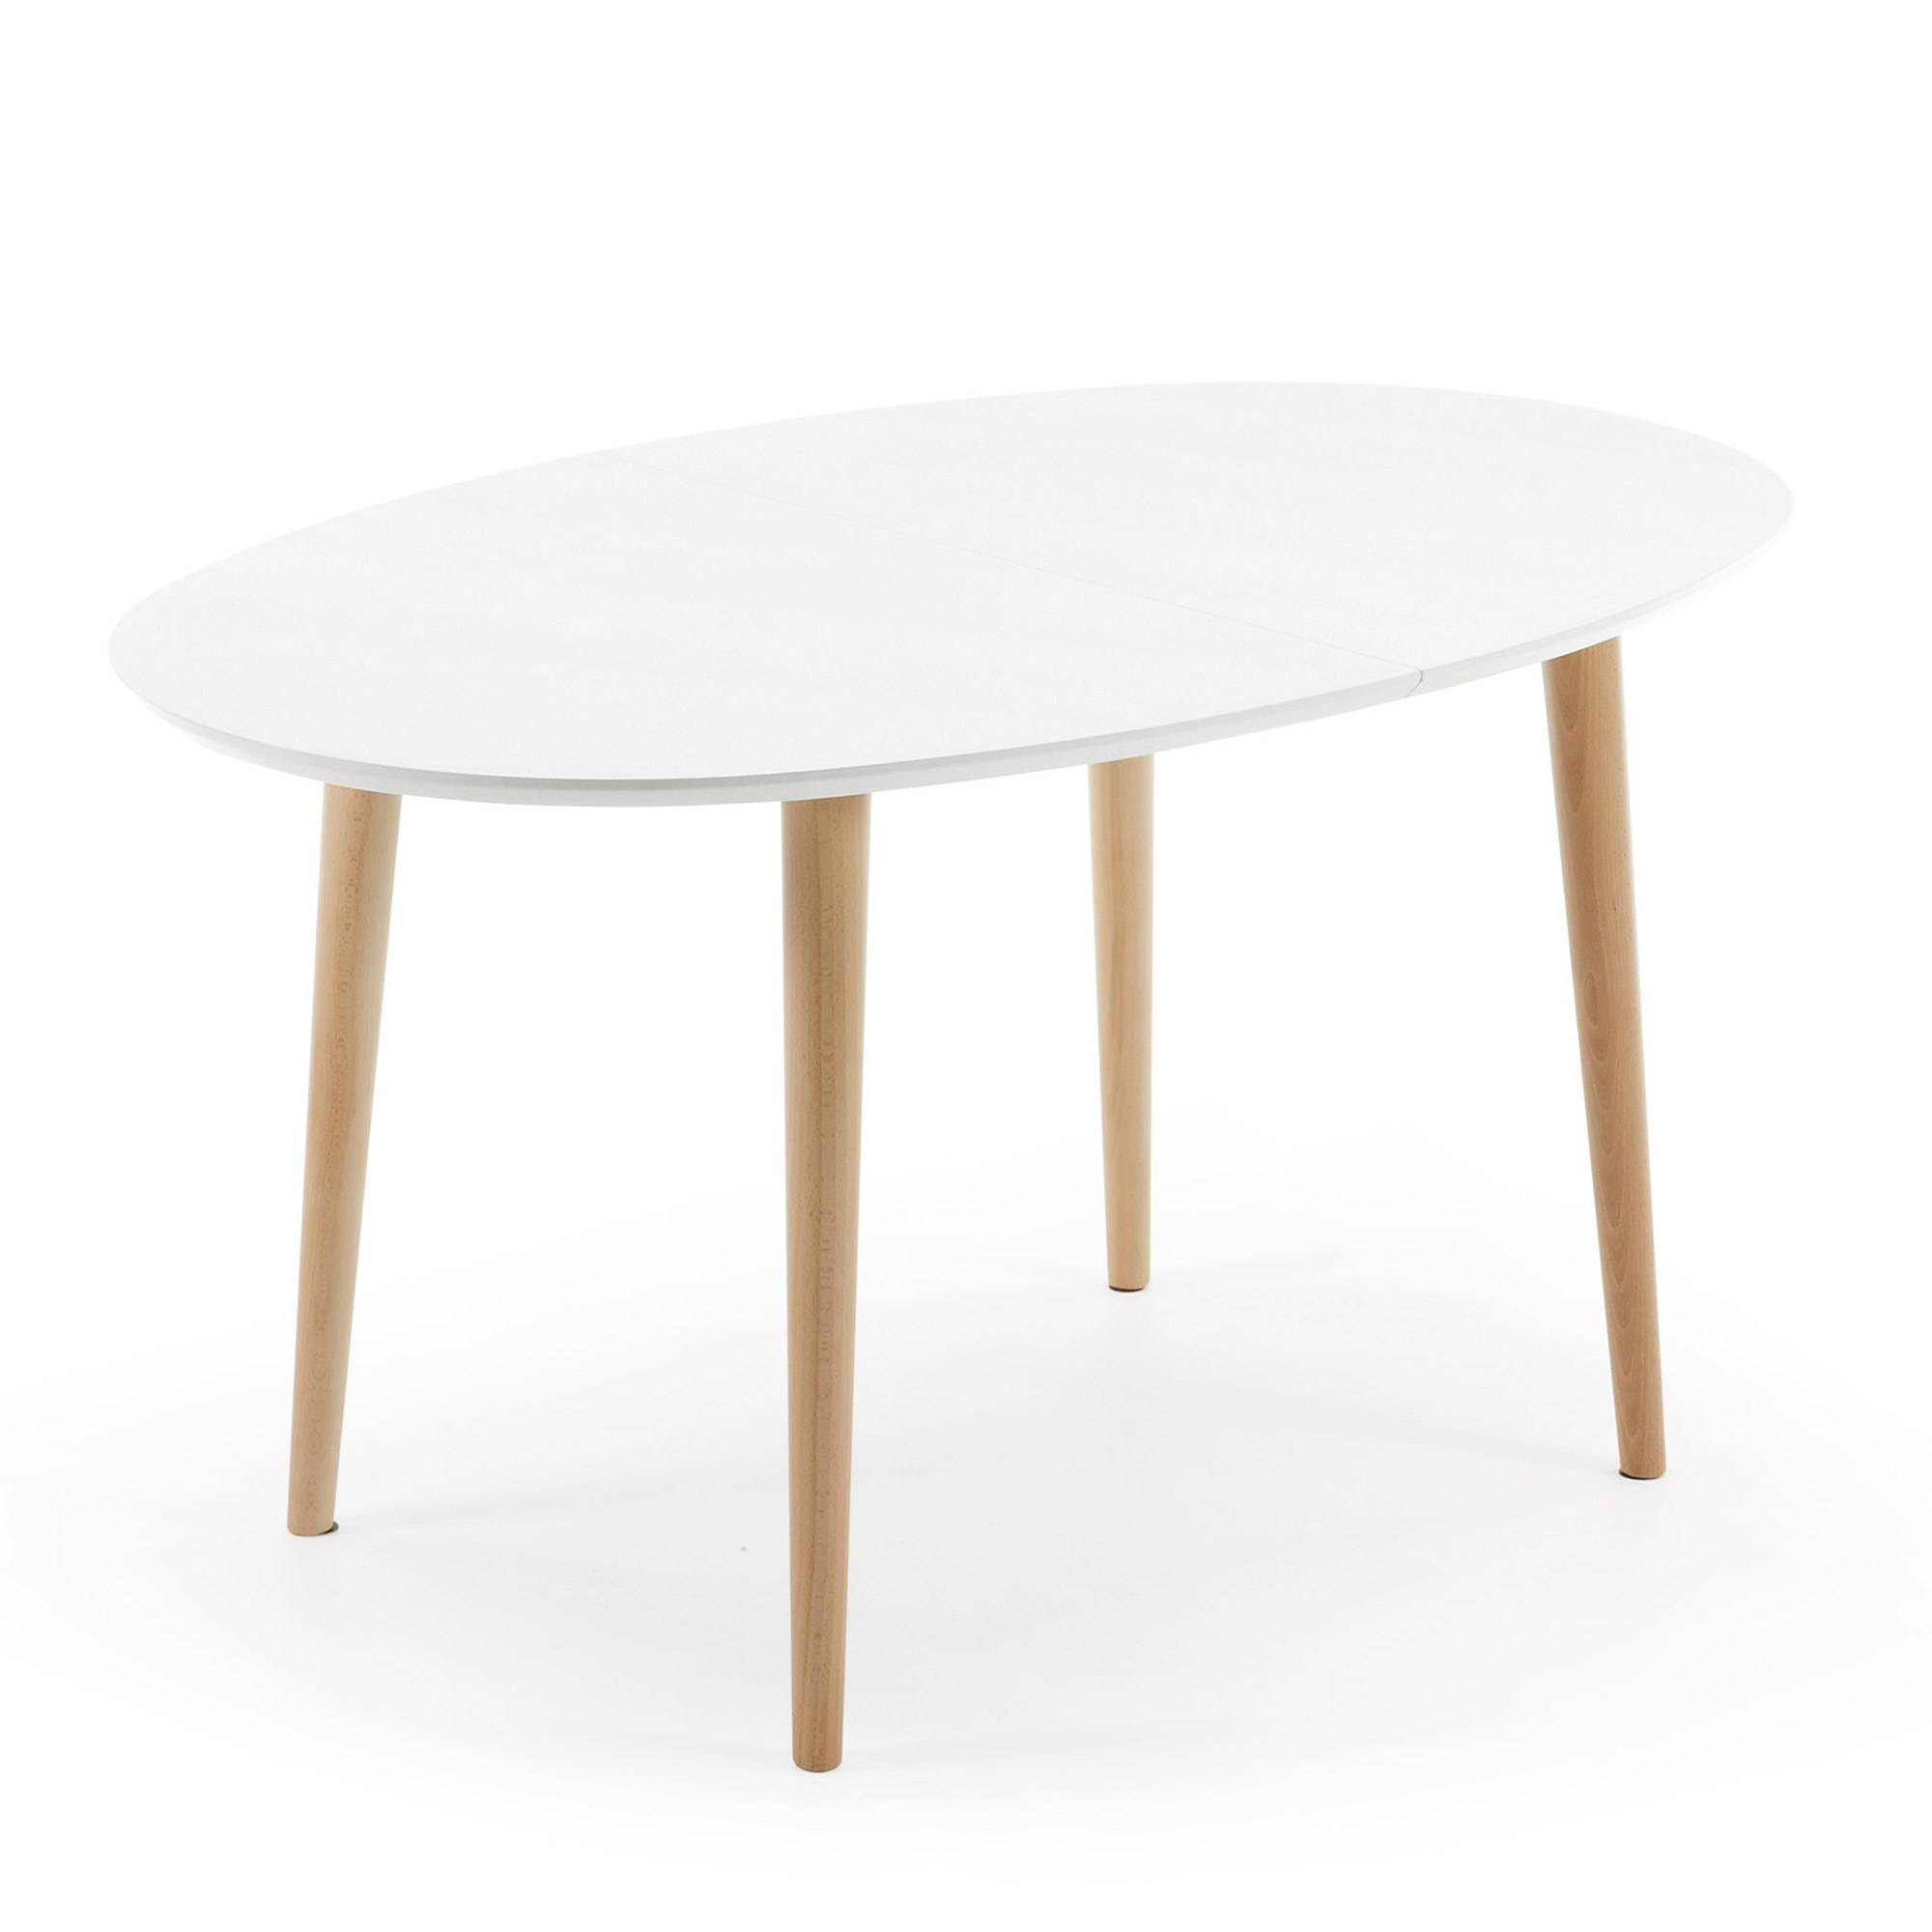 Kave Home Oqui tavolo allungabile 140-220 cm bianco